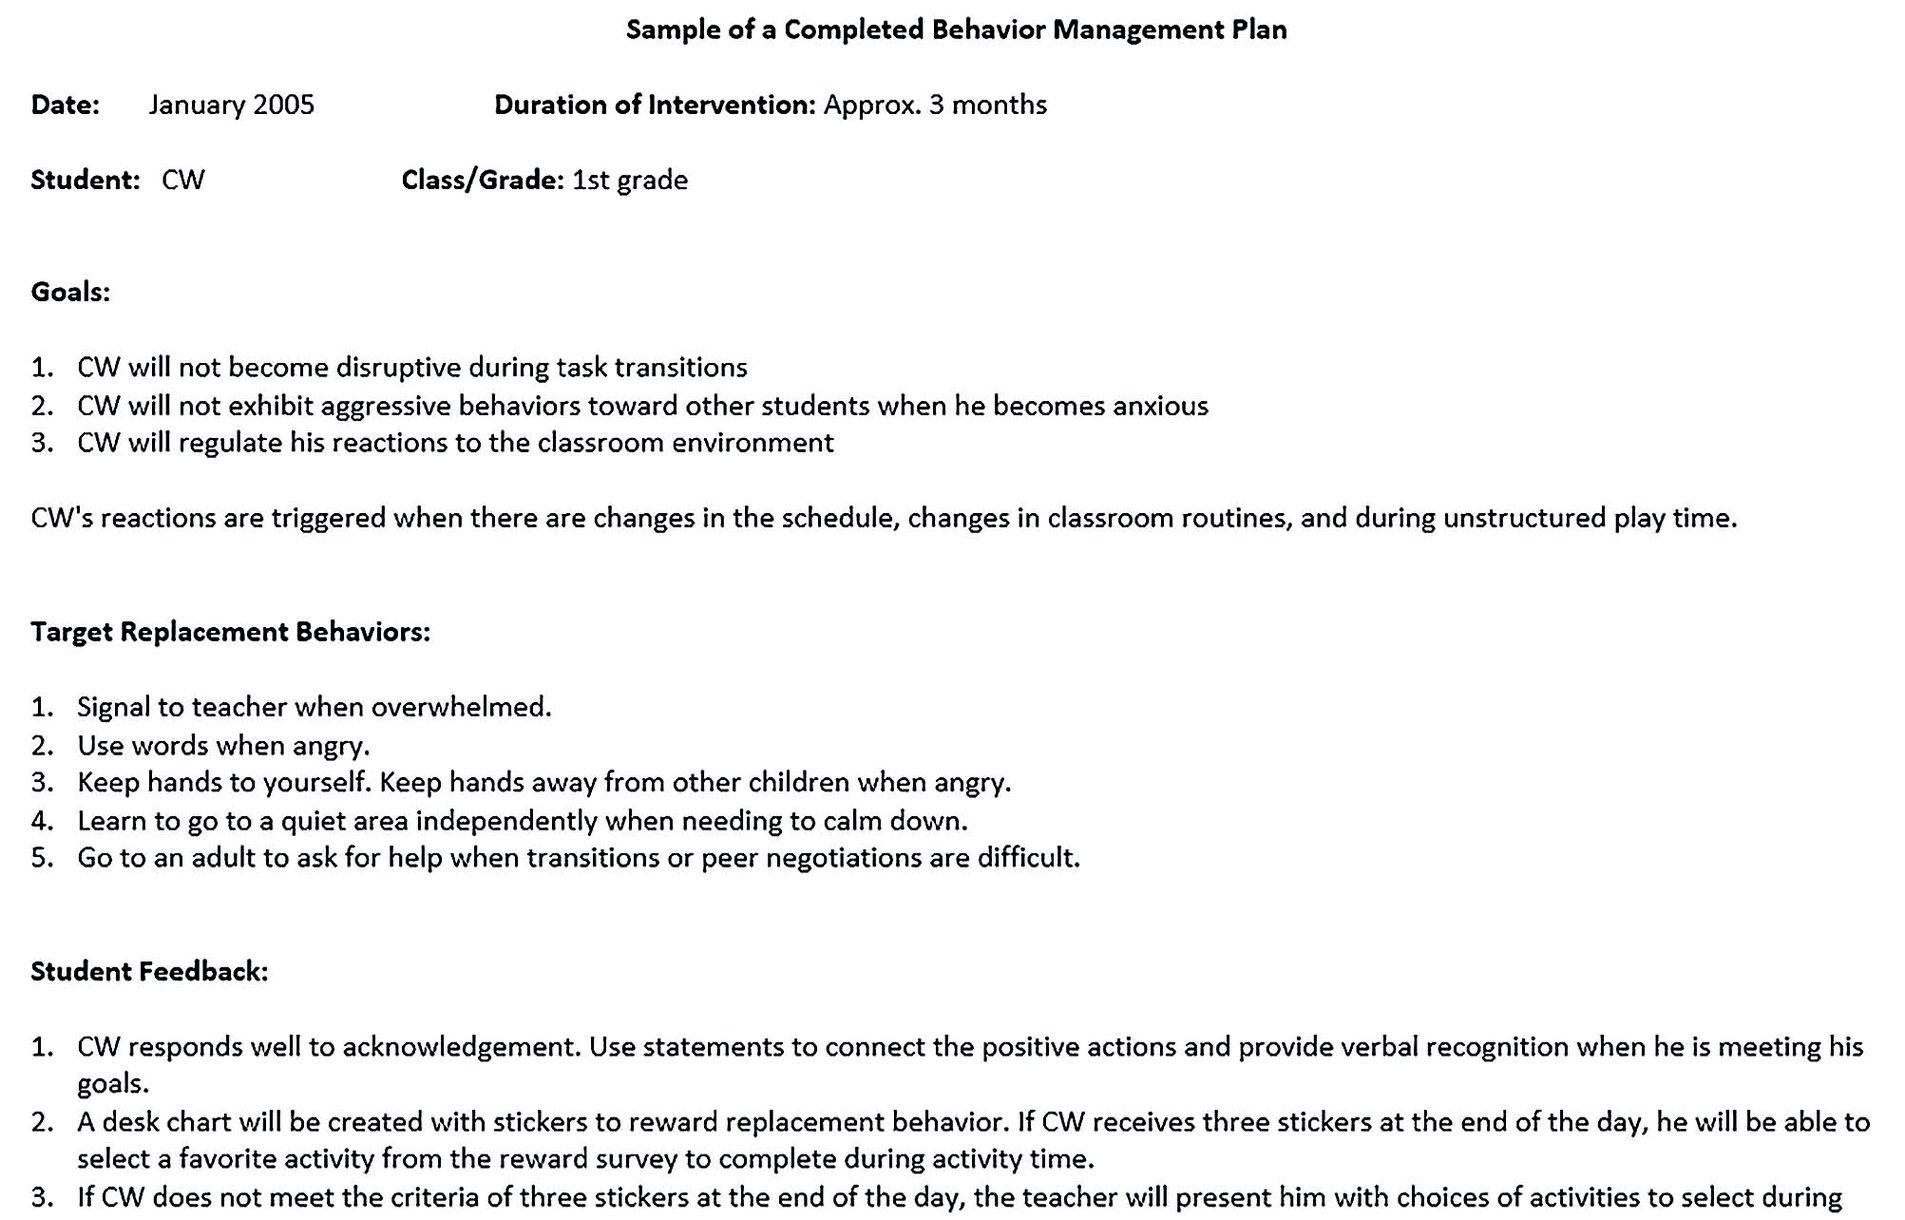 sample management plan 1